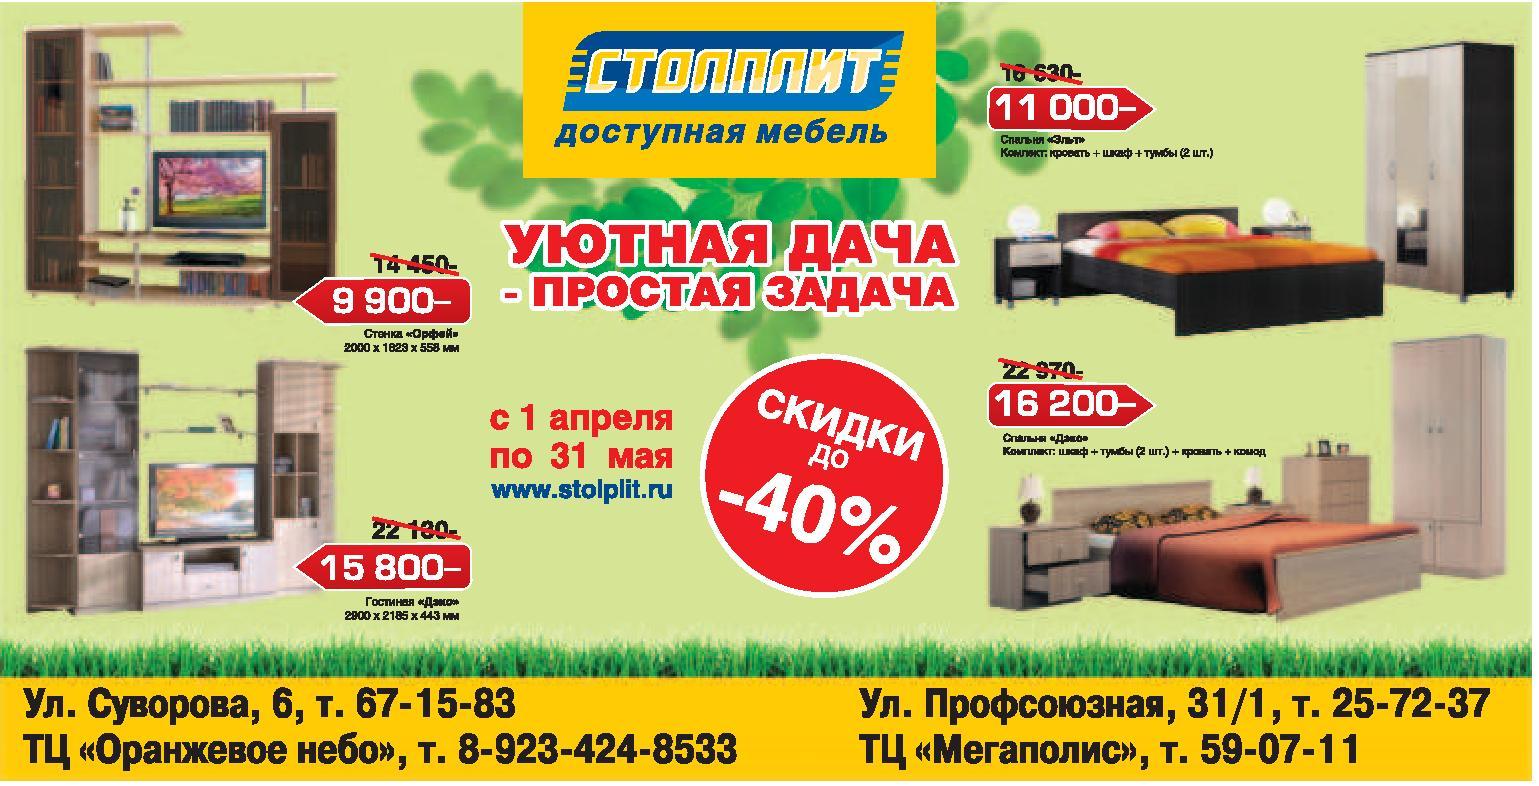 Газета реклама выпуск 16 20 04 2013